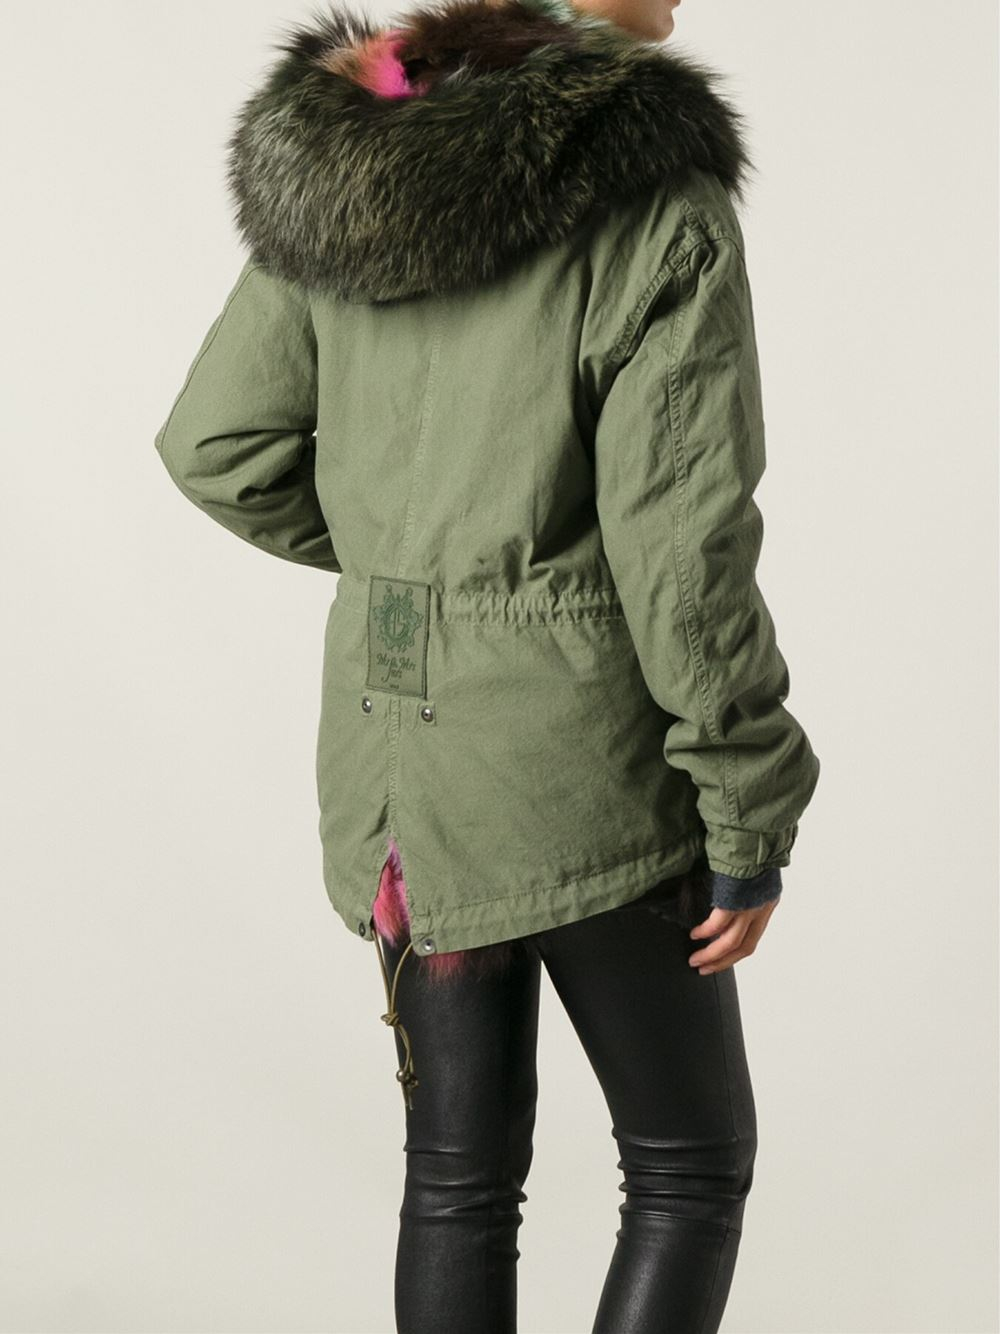 Mr & mrs italy Fur Trim Parka Coat in Green   Lyst